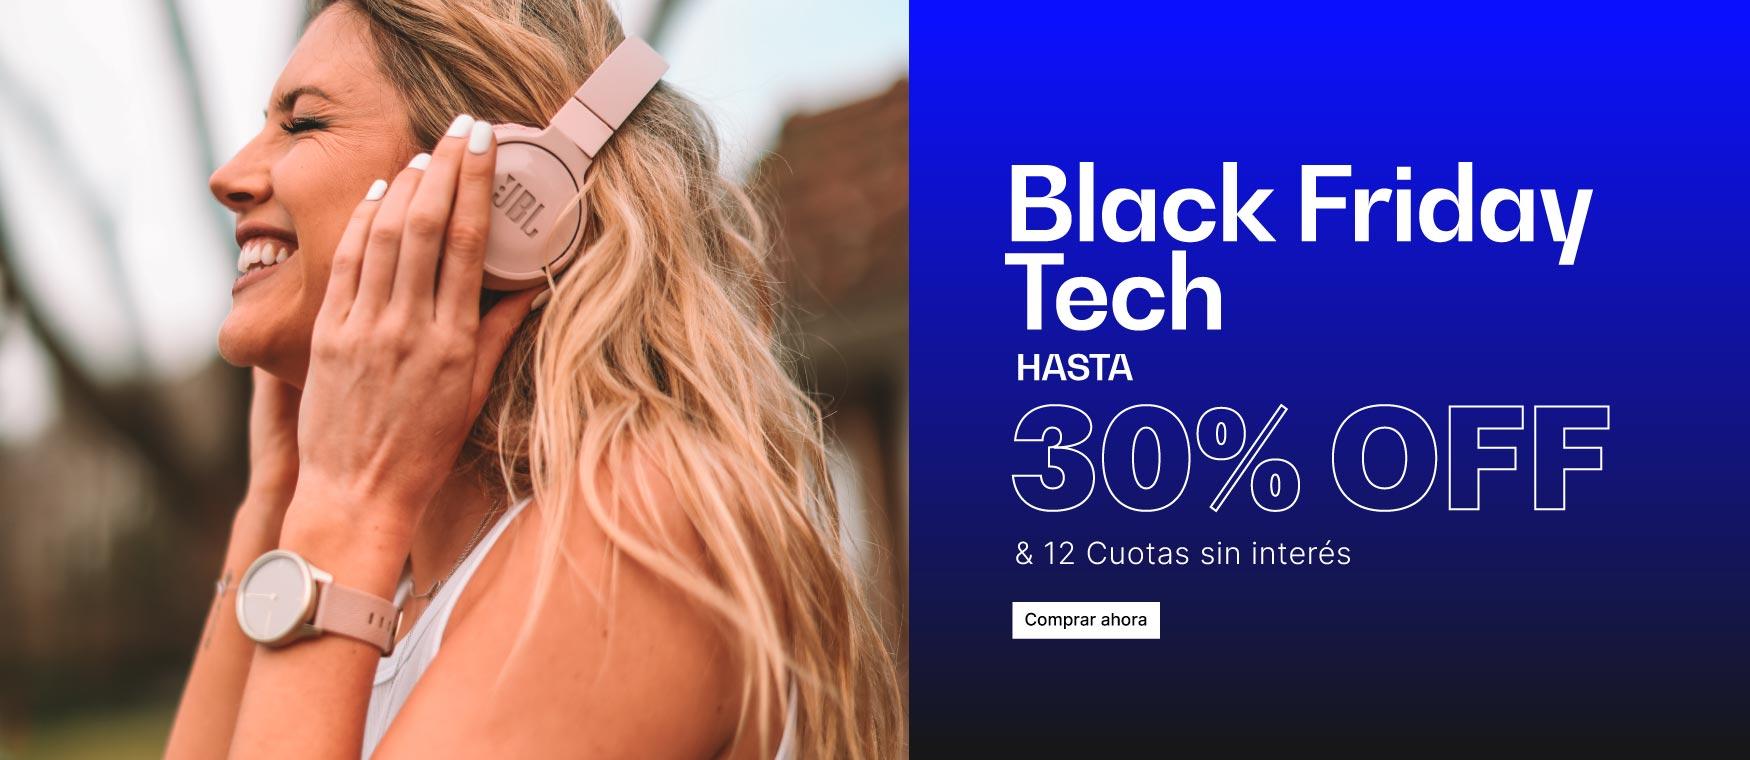 Tech en Black Friday!